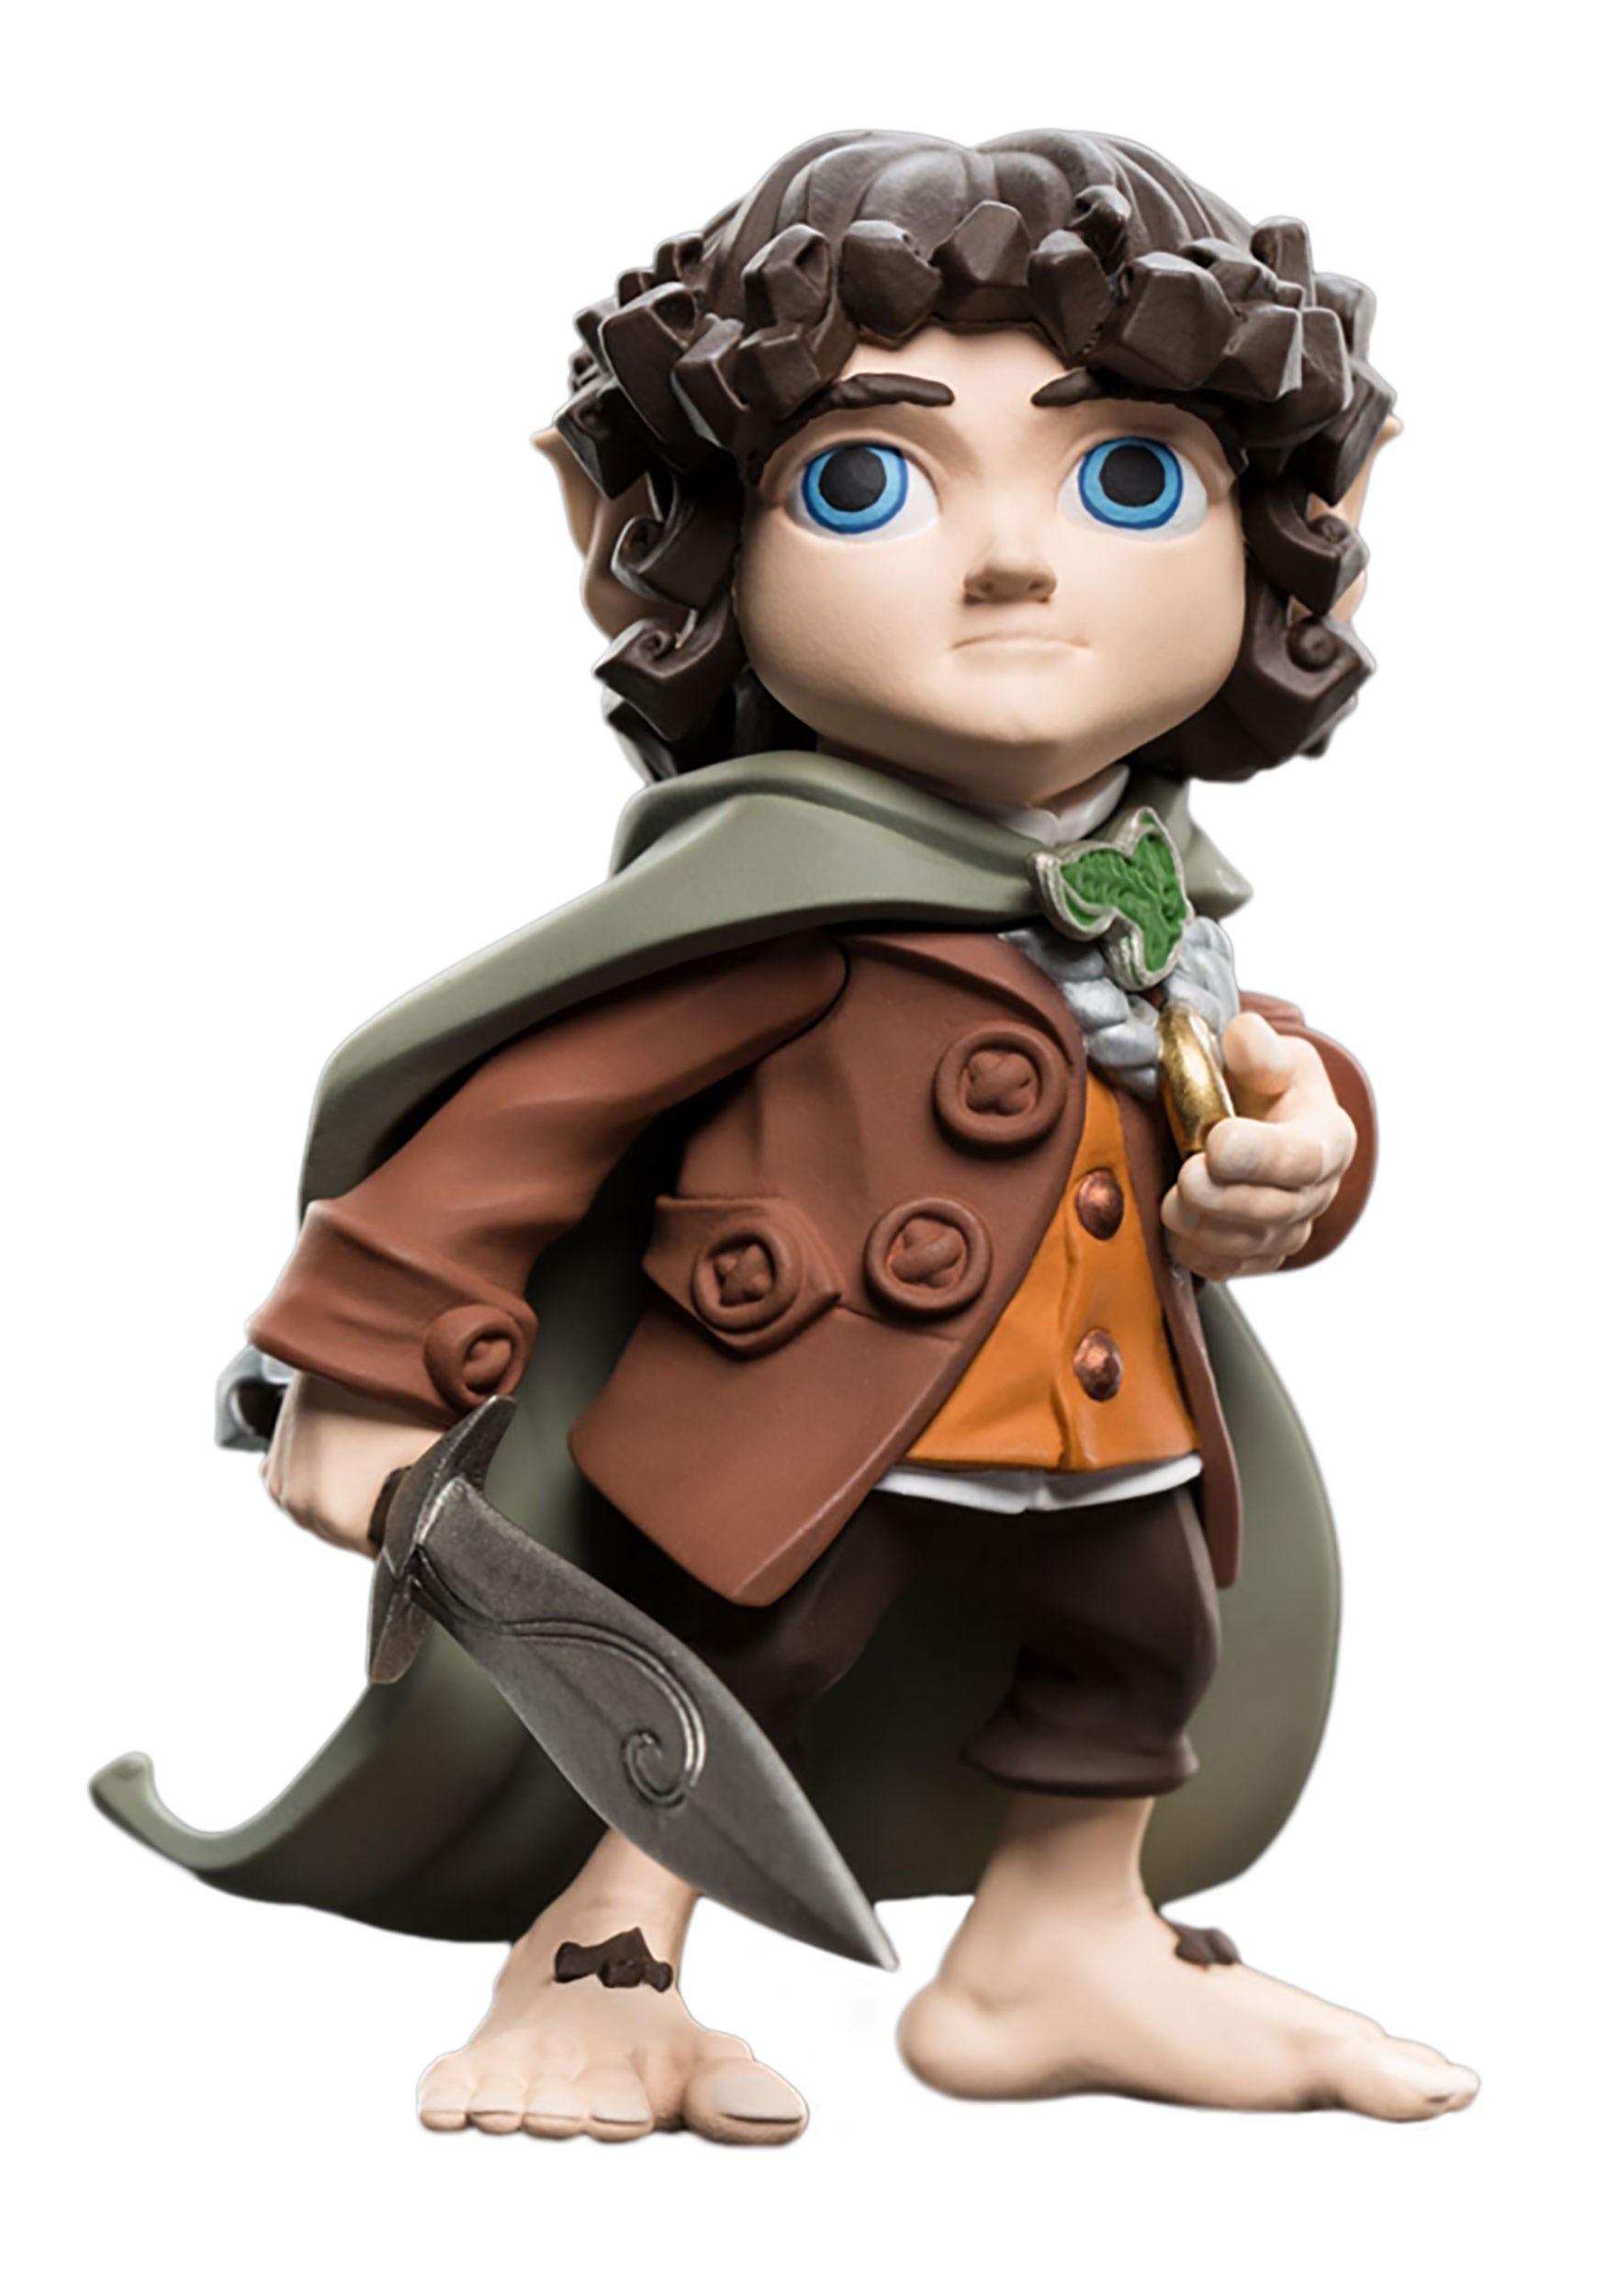 Frodo Baggins Lord of the Rings Weta Mini Epics Vinyl Figure